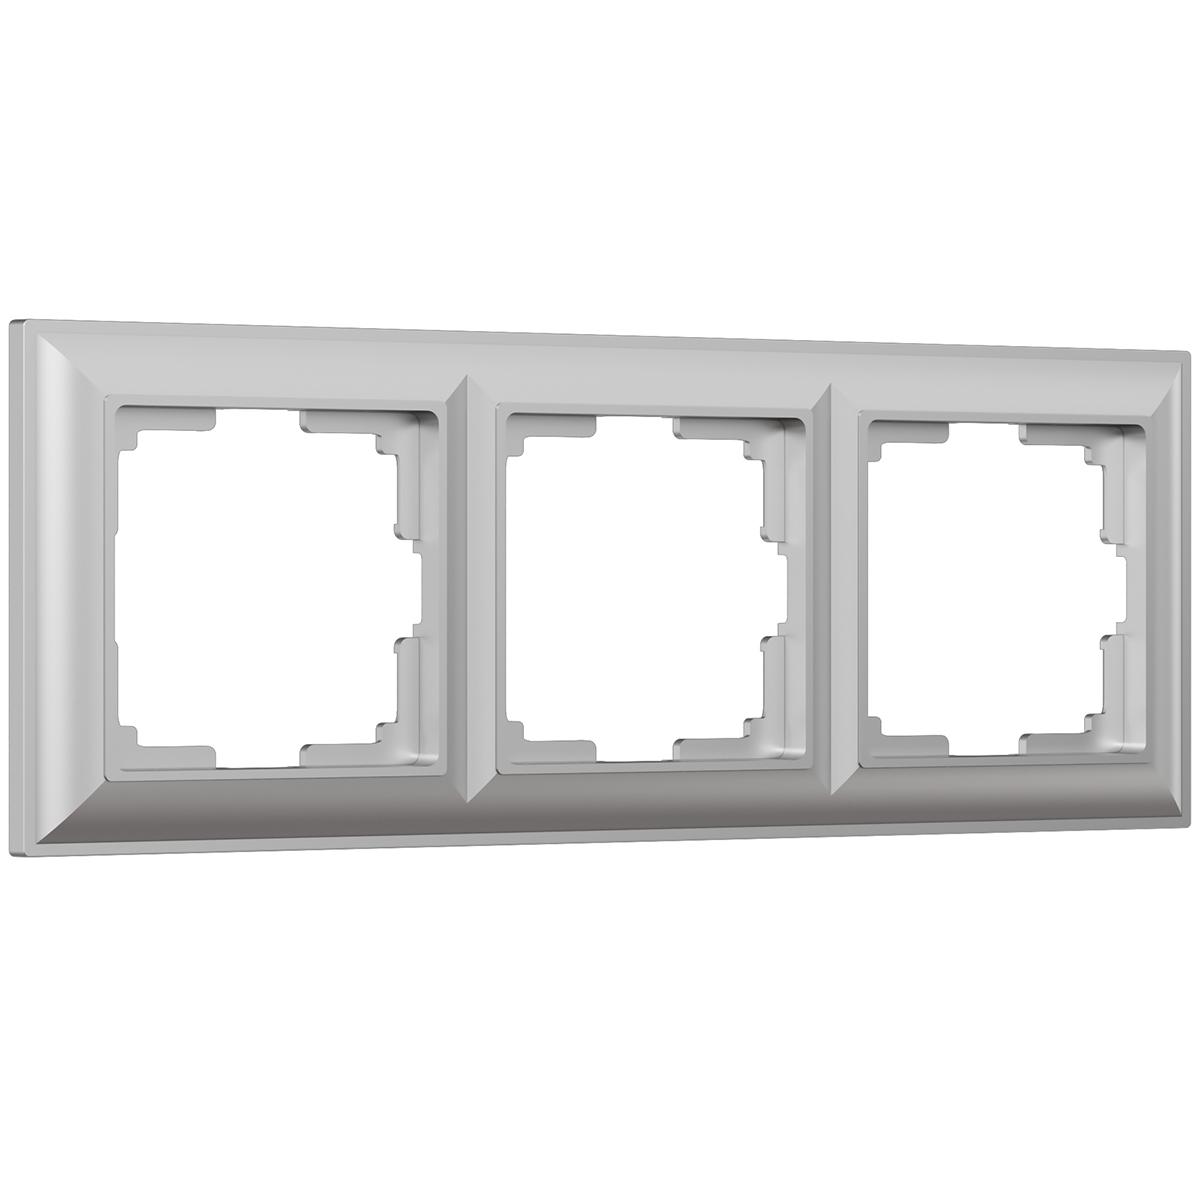 цена Рамка Fiore на 3 поста серебряный WL14-Frame-03 4690389109126 онлайн в 2017 году